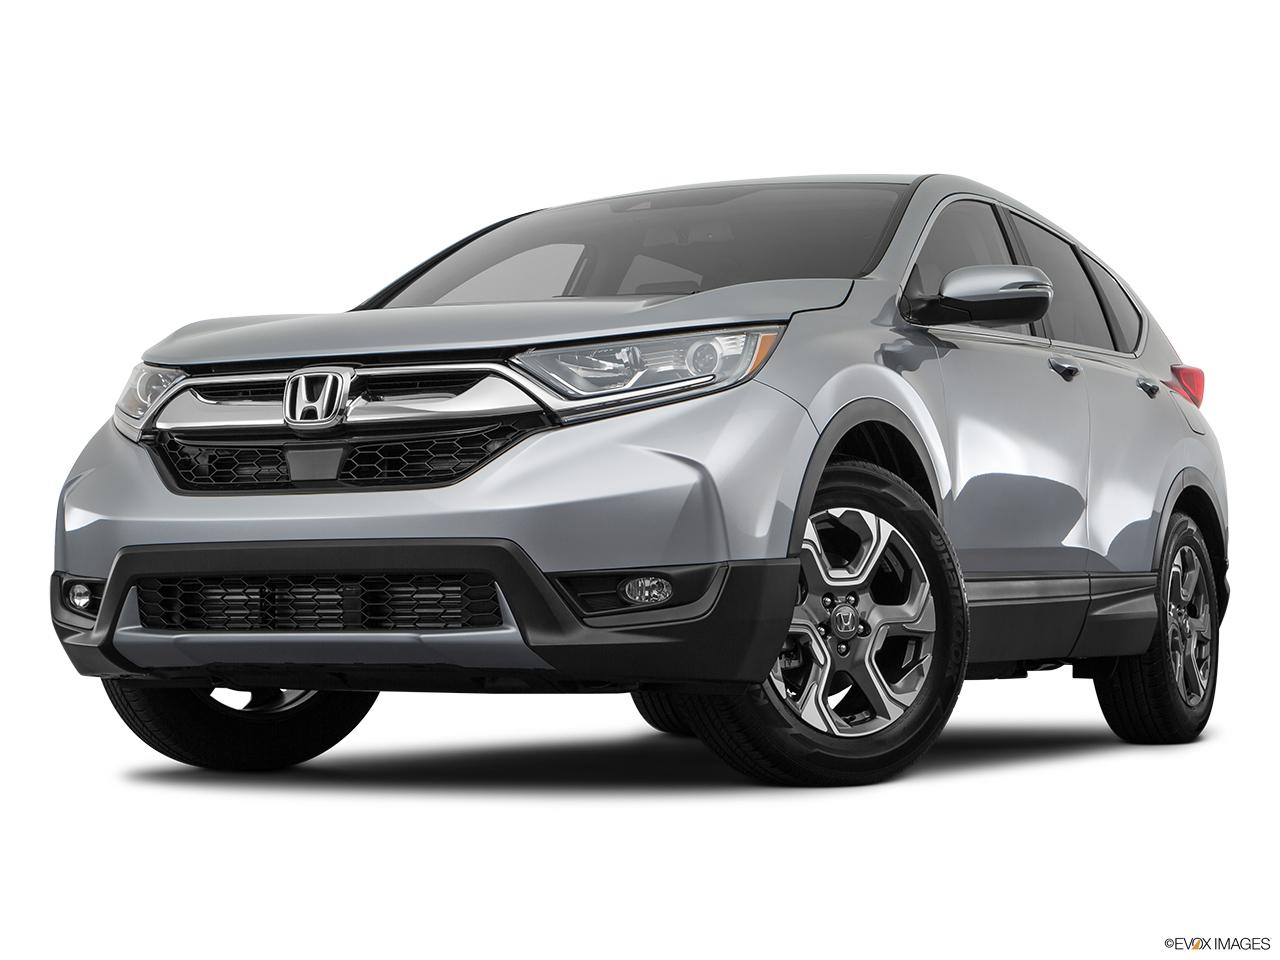 Car features list for honda cr v 2017 2 4 ex kuwait for Honda cr v ex 2017 price